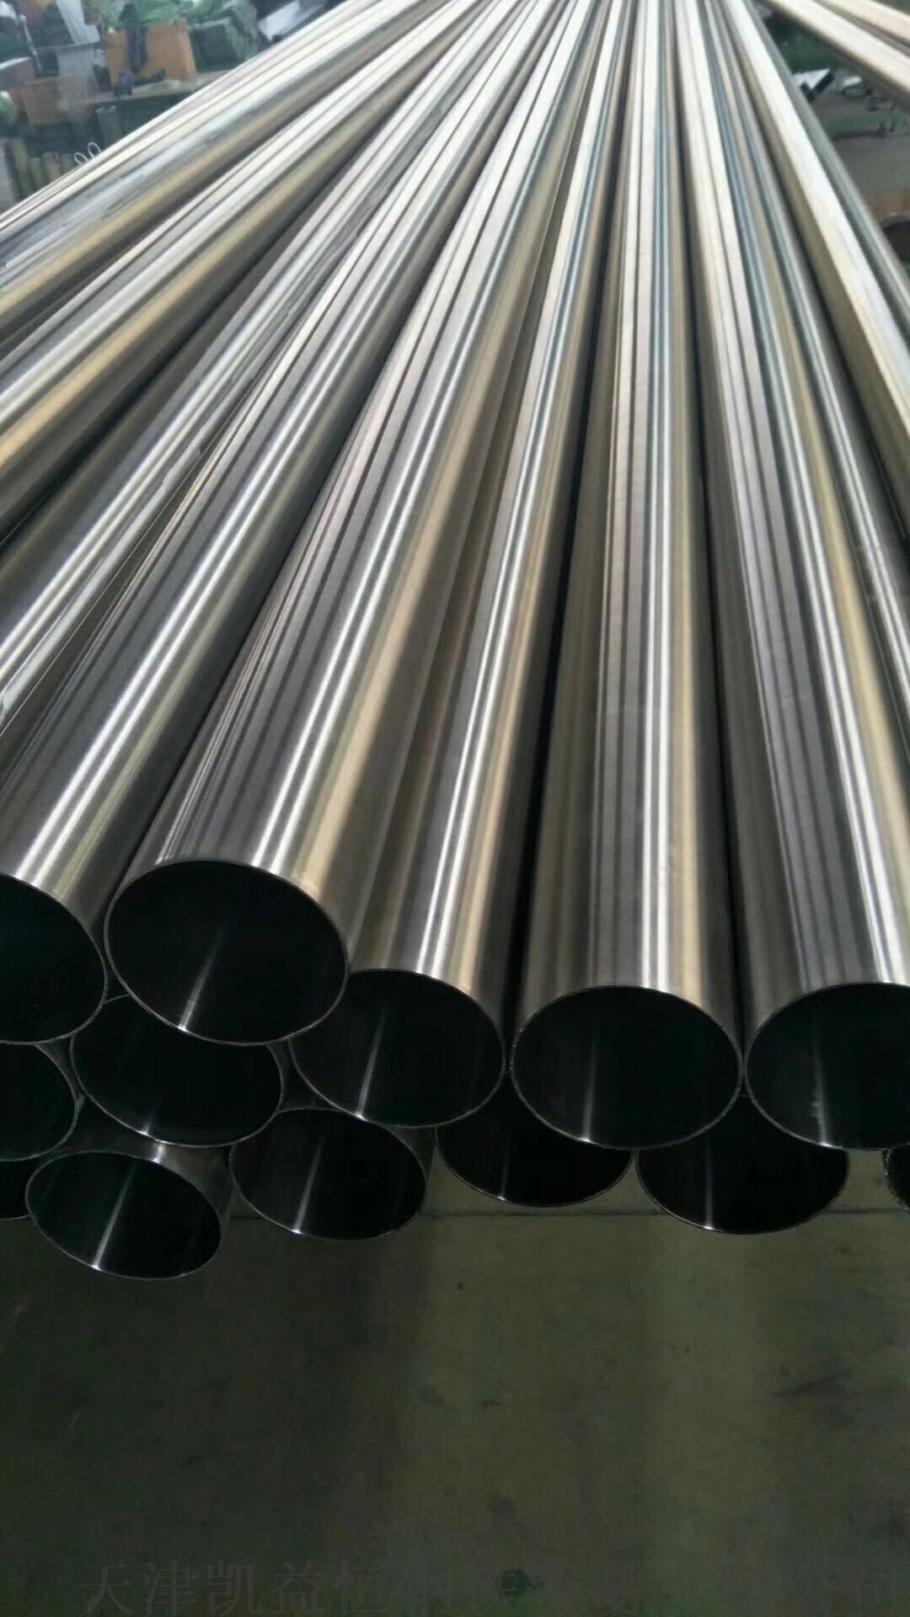 TP321不锈钢焊管厂 S32168不锈钢焊管报价830692165